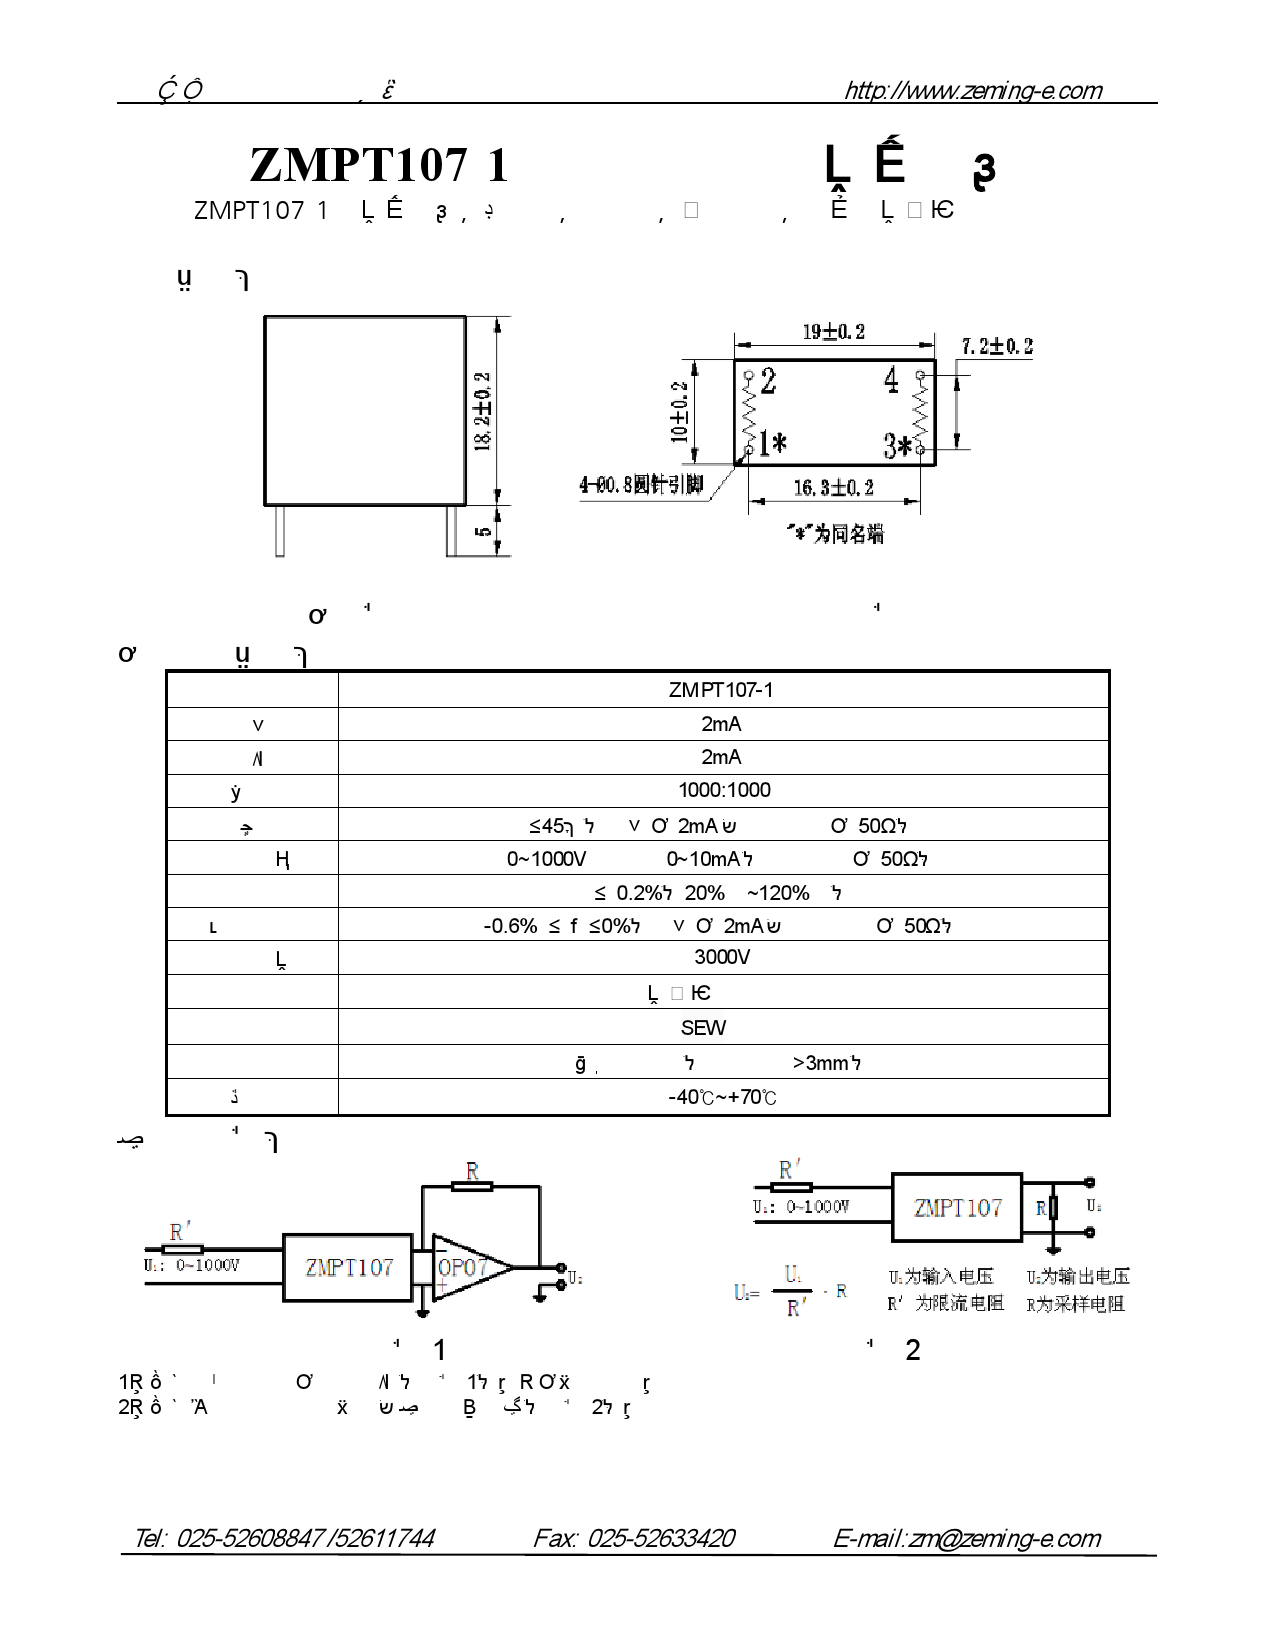 1999 ez go txt wiring diagram 13 pin trailer plug mpt 1000 wire gmc jimmy